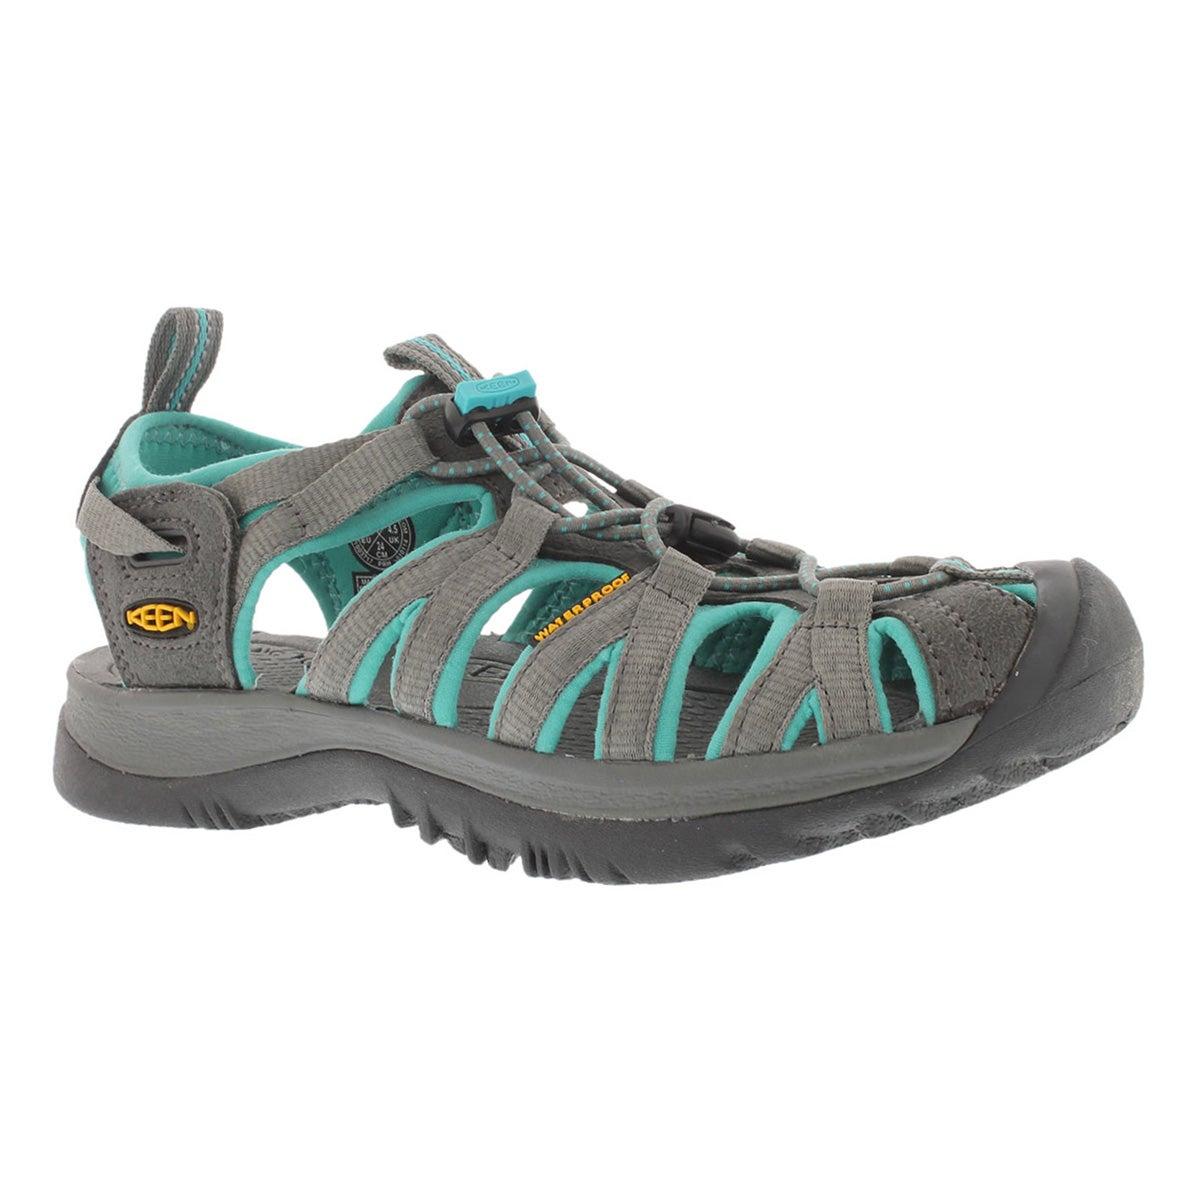 Women's WHISPER dark shadow/green sport sandals